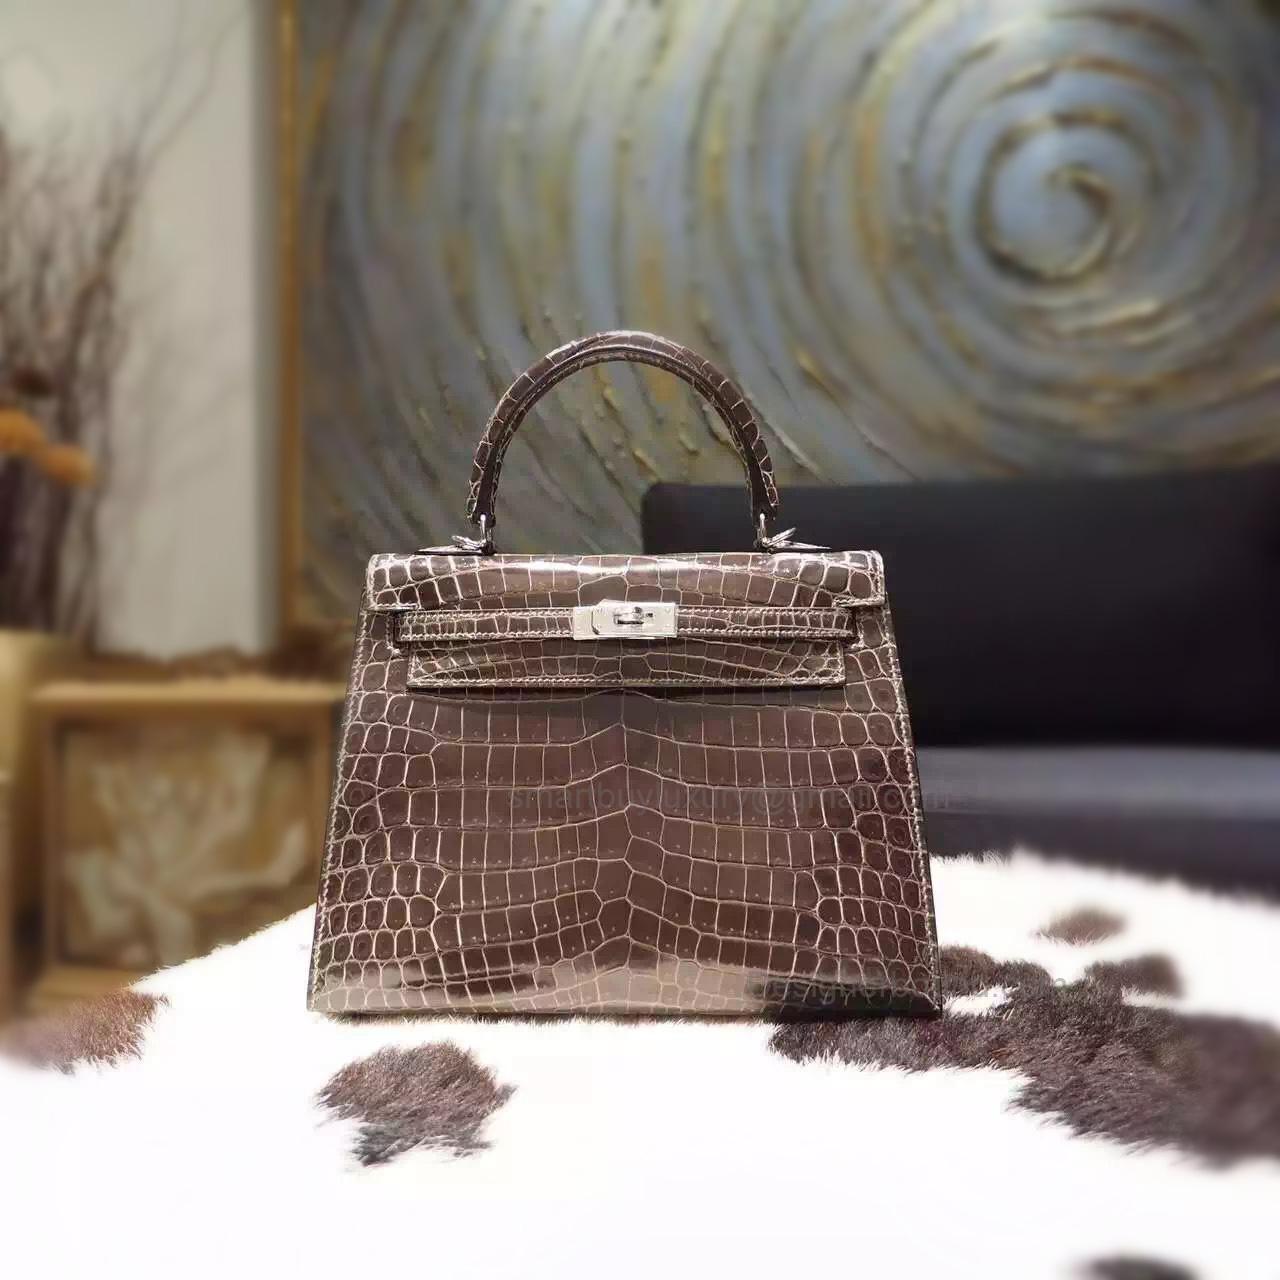 269aeb2156f7 Replica Hermes Kelly 25 Handmade Bag in ck88 Graphite Shining Porosus Croc  SHW